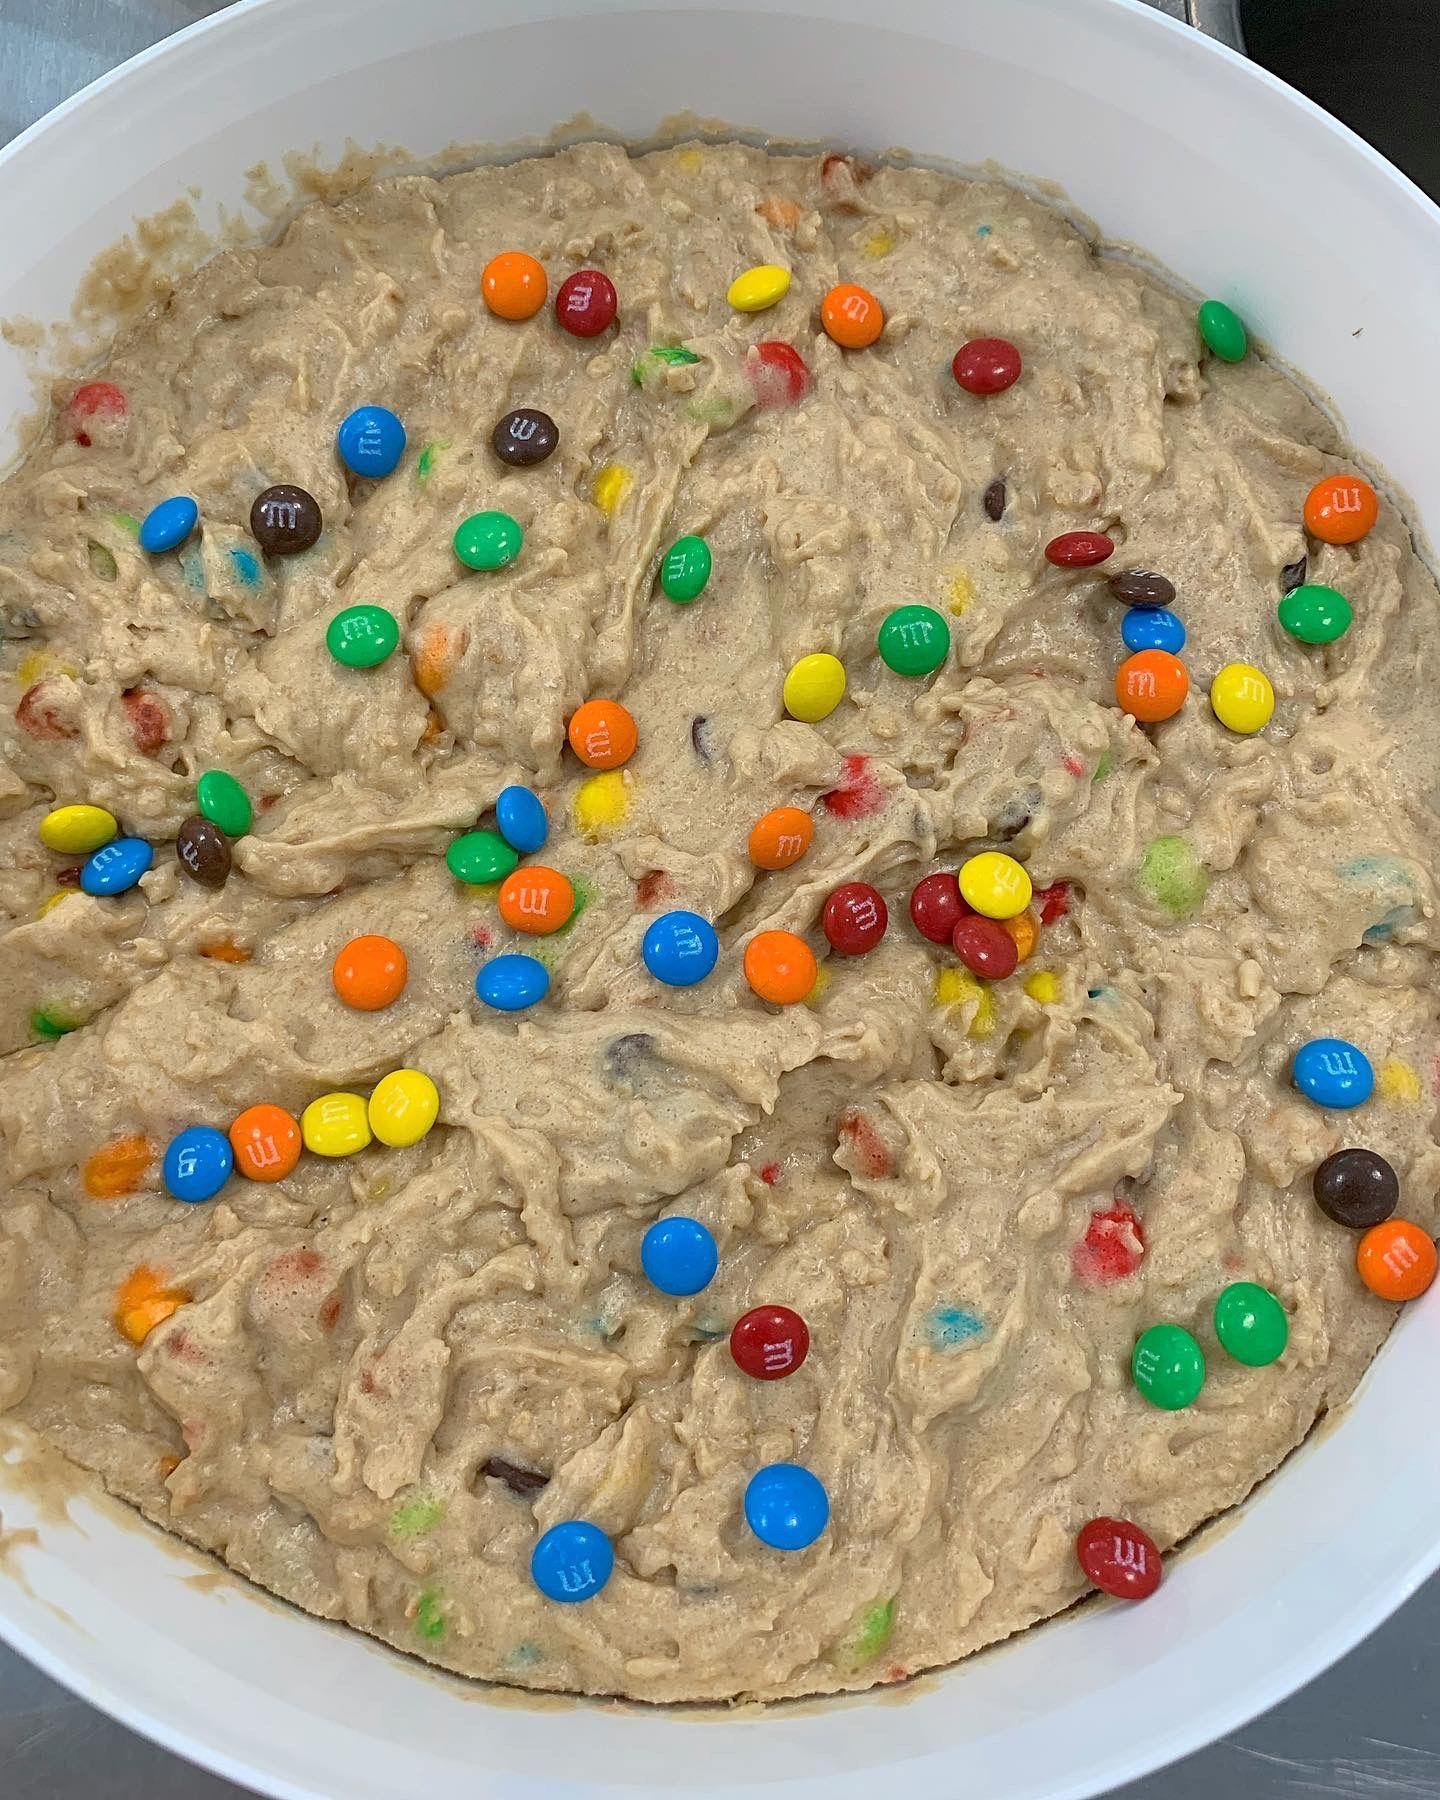 Bulk Tubs Monster M M Edible Cookie Dough Peanut Butter The Cookie Dough Cafe Bulk Cookies Edible Cookie Dough Cookie Dough